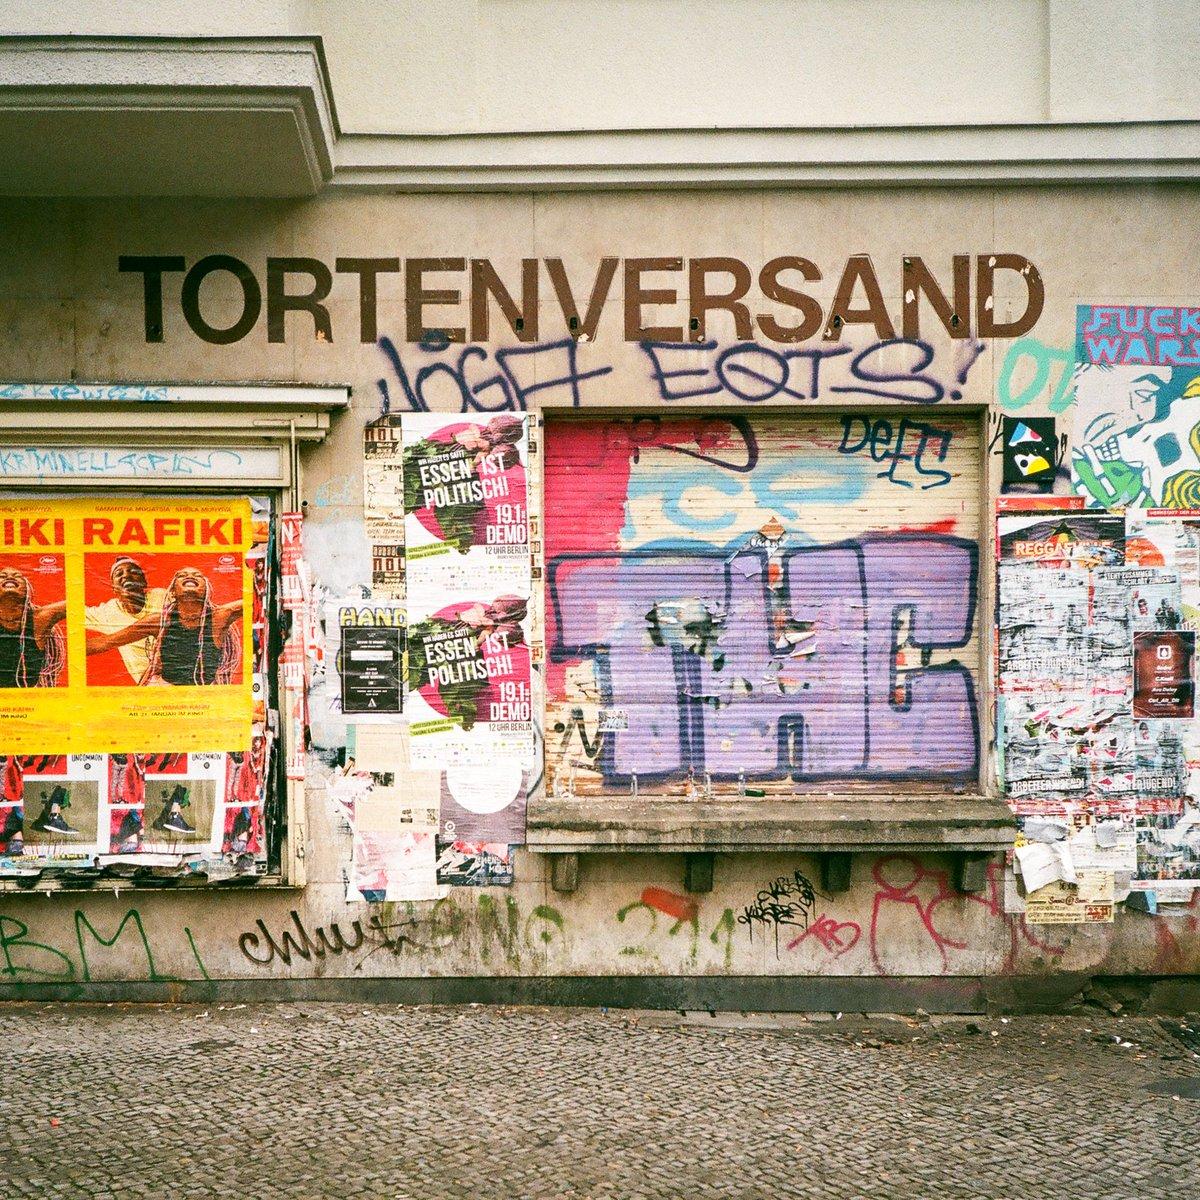 Tortenversand. Berlin, Germany. . #Leica mini. . #35mmfilm #analog #analogue #film #filmisnotdead #filmisalive #analogforever #shootfilm #filmfeed #filmphoto #believeinfilm #keepfilmalive #filmwave #filmforever #tortenversand #sonnenallee #neukölln #neuköllnvibes #berlinpic.twitter.com/Fo0WqvsrNQ  by analogMoFo